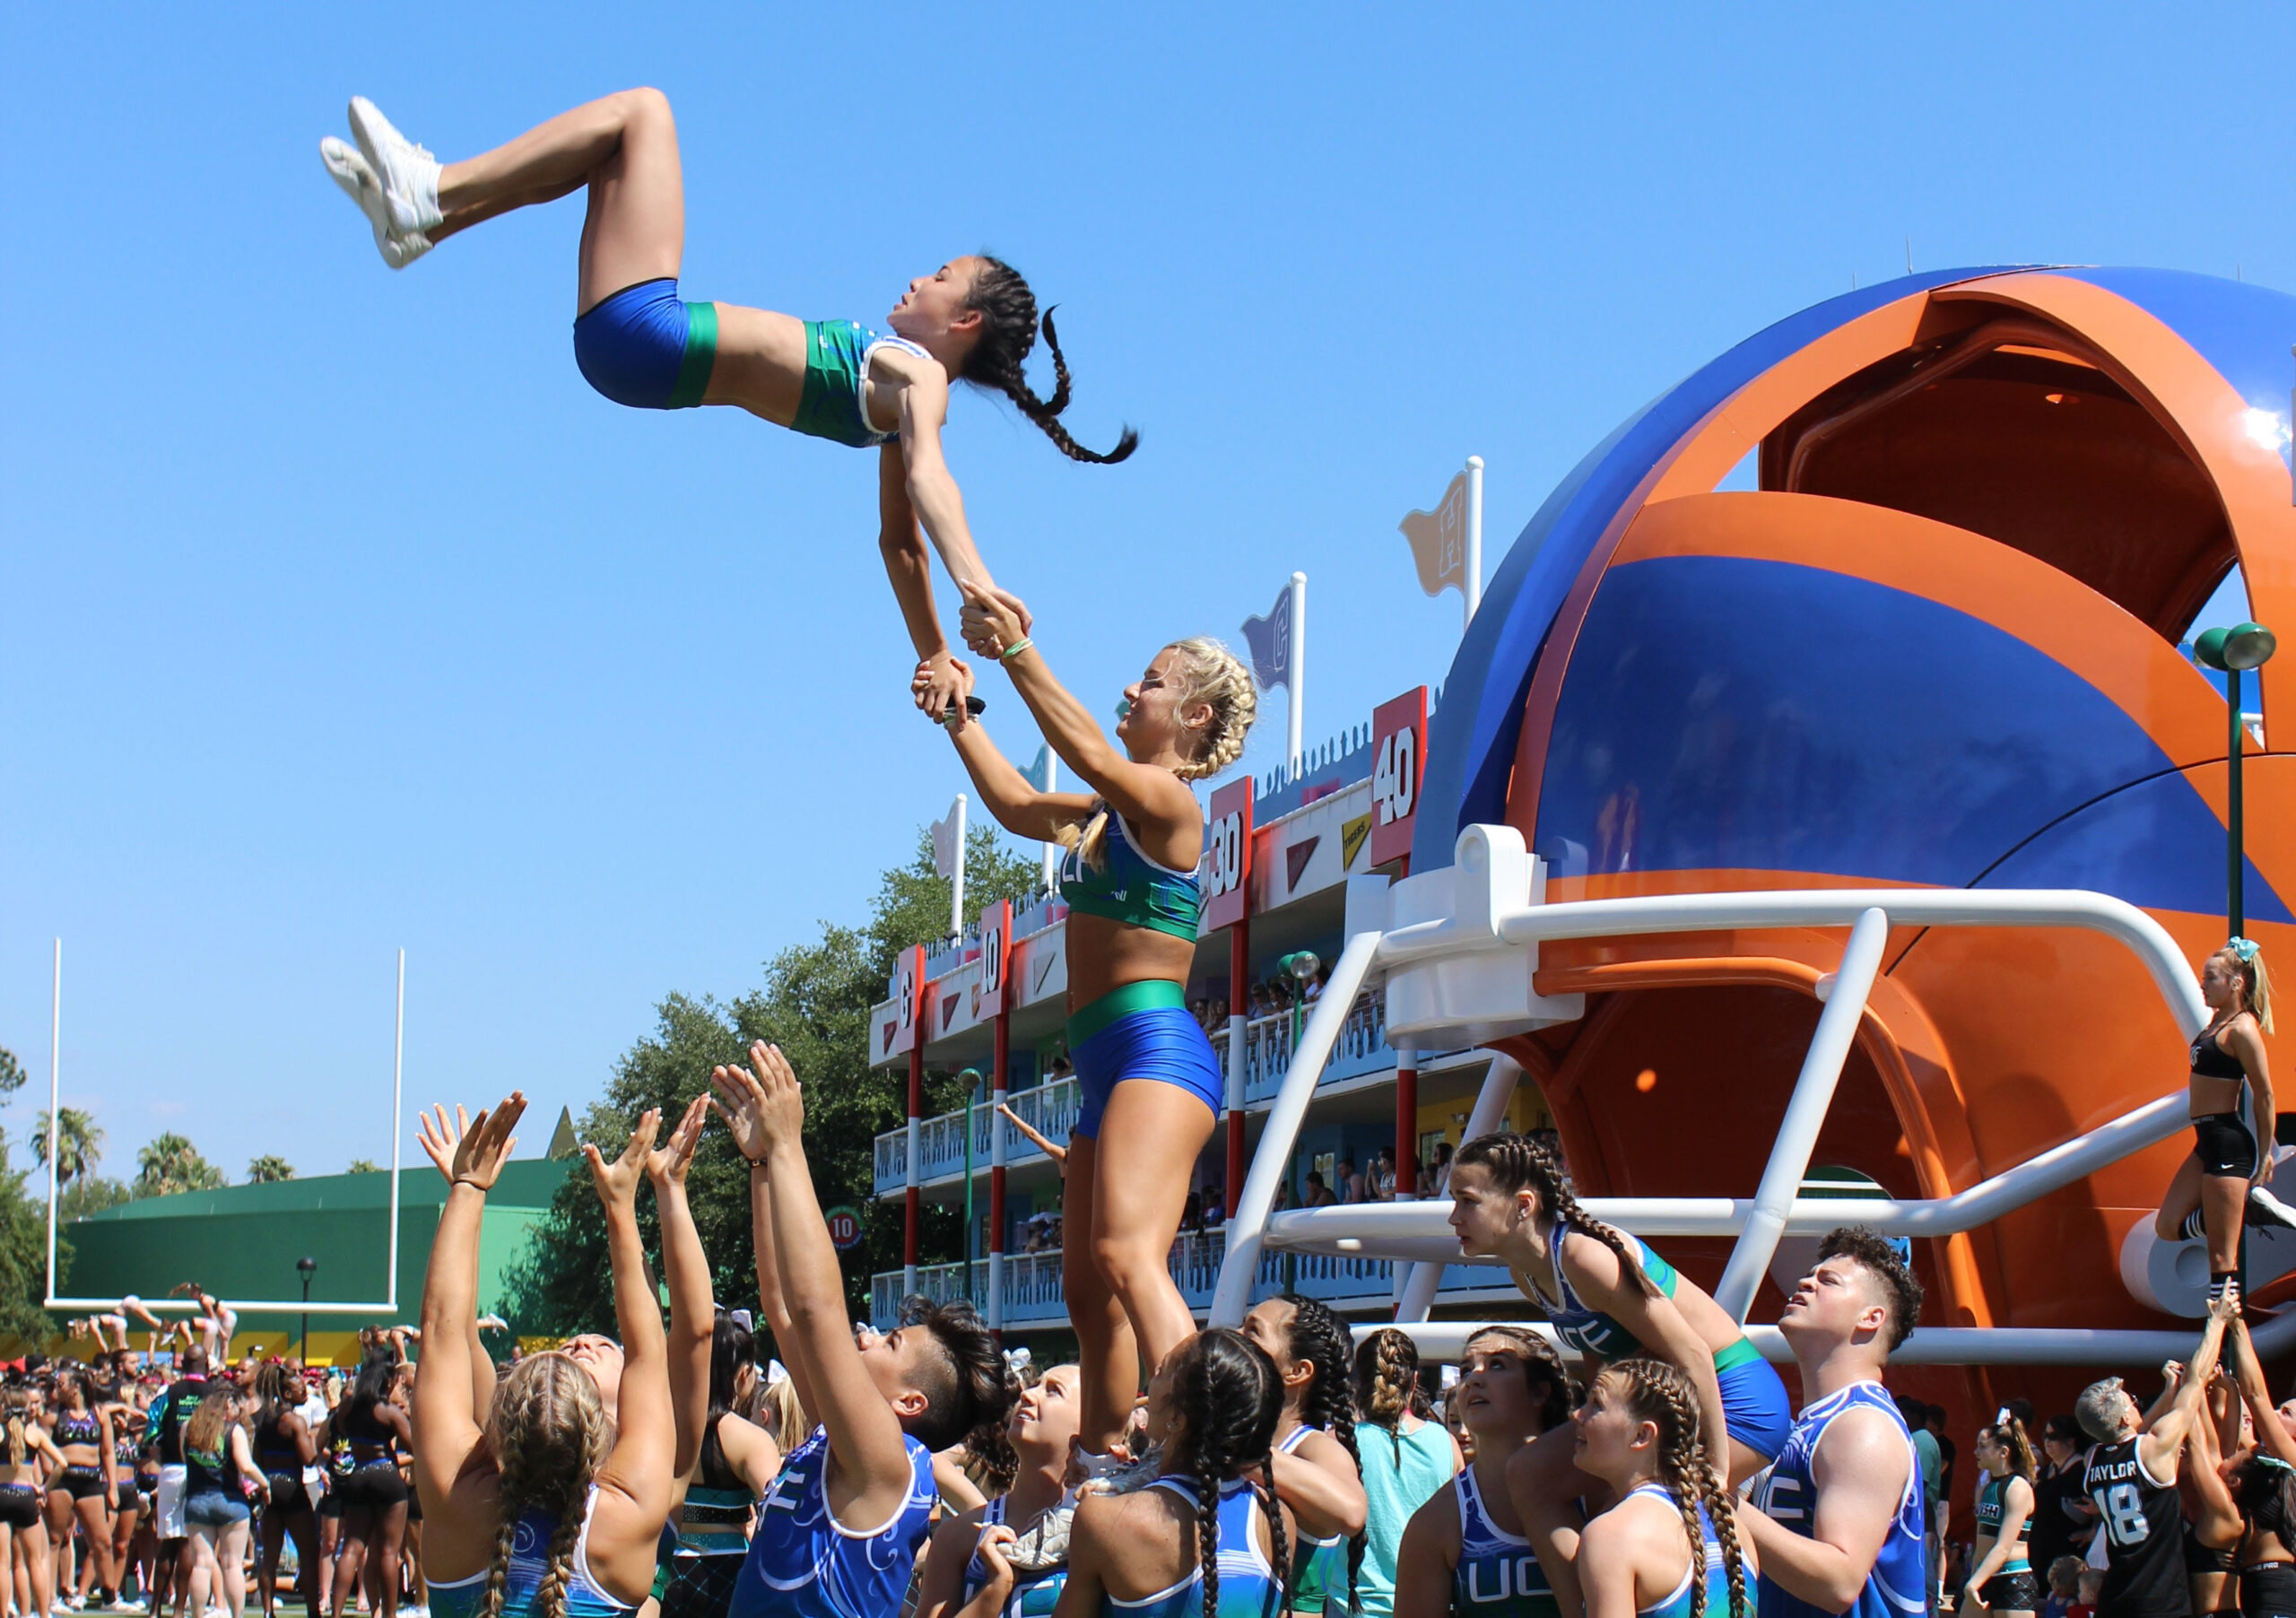 How much should a cheerleader flyer weigh?